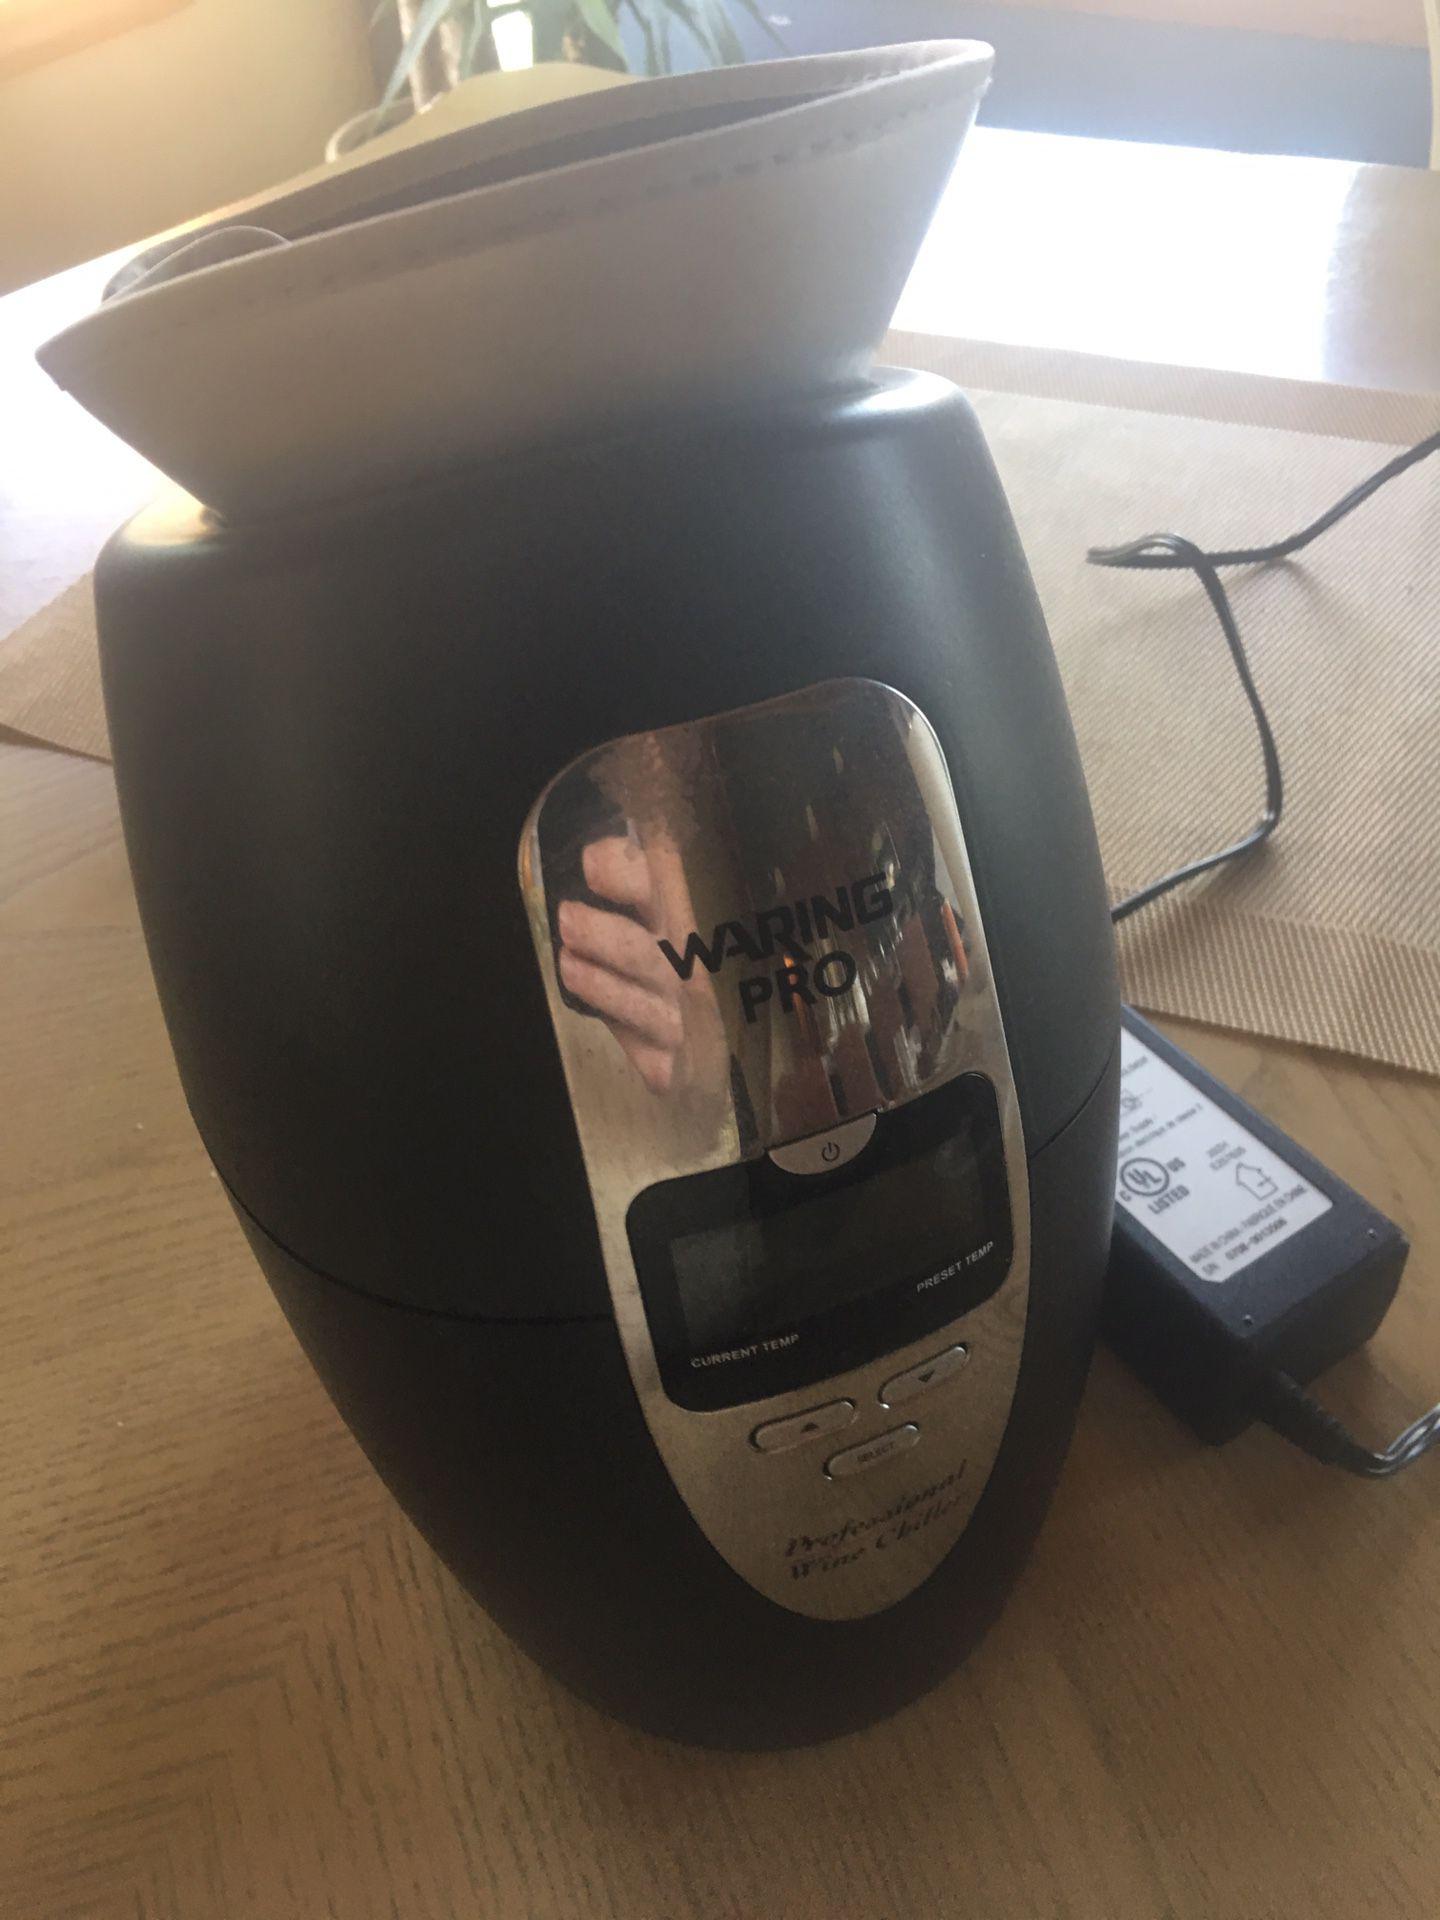 Waring Pro professional wine chiller